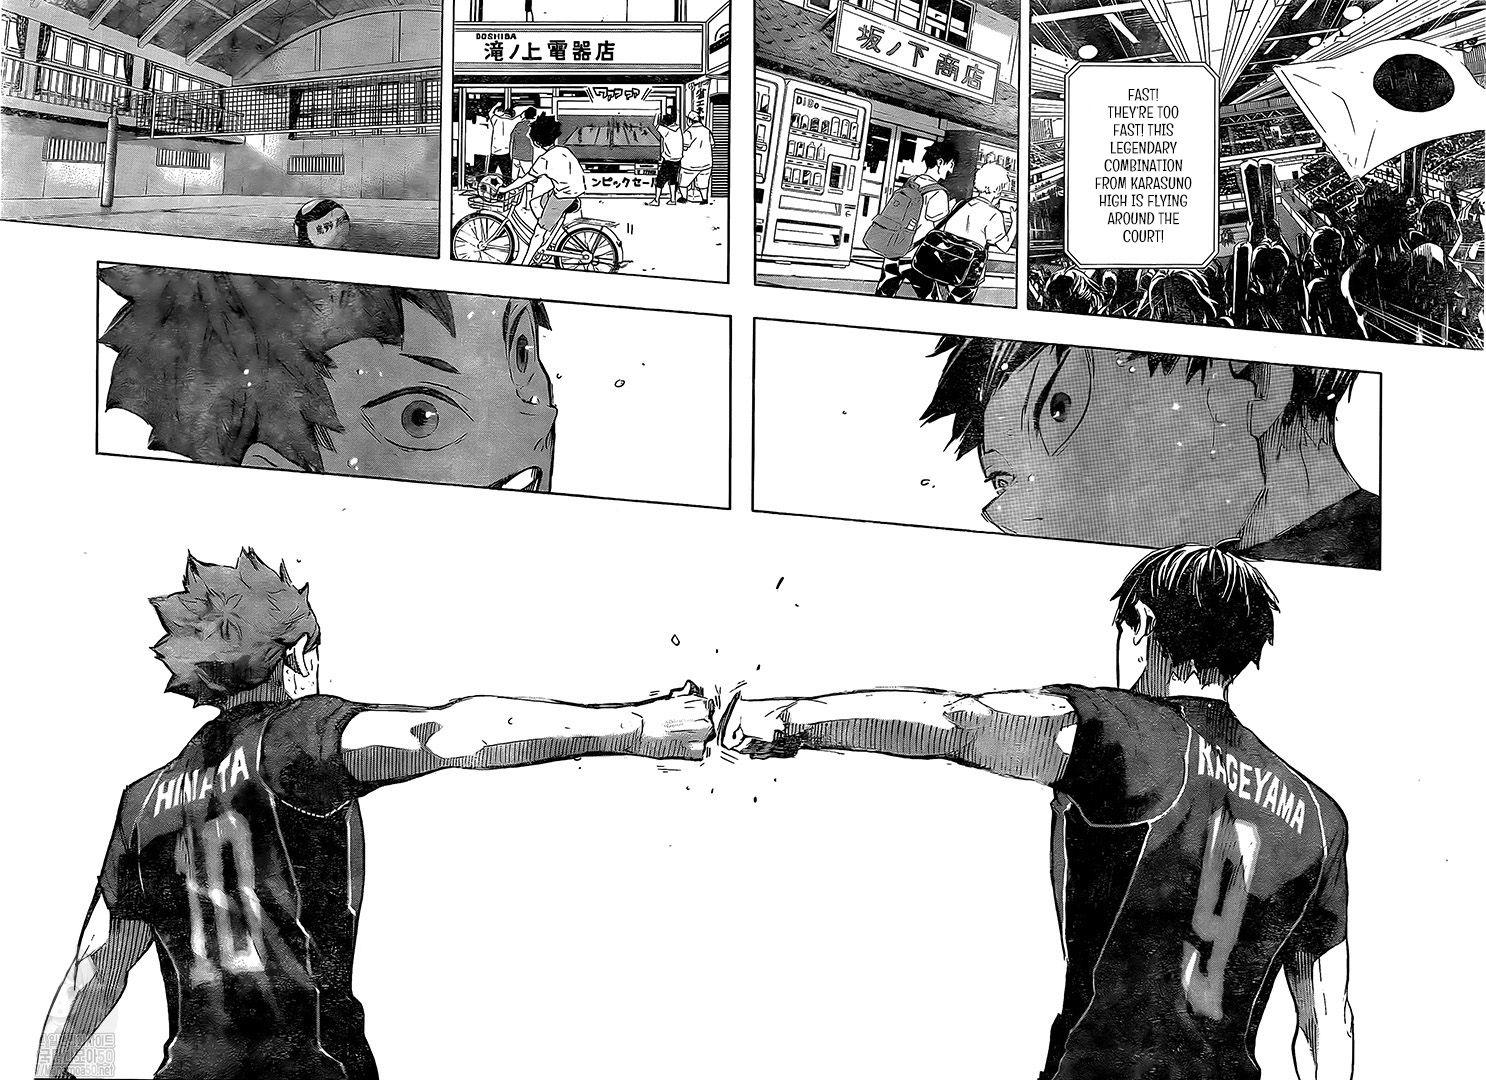 Read All Chapters Of Haikyuu Manga In 2020 Haikyuu Manga Haikyuu Anime Haikyuu